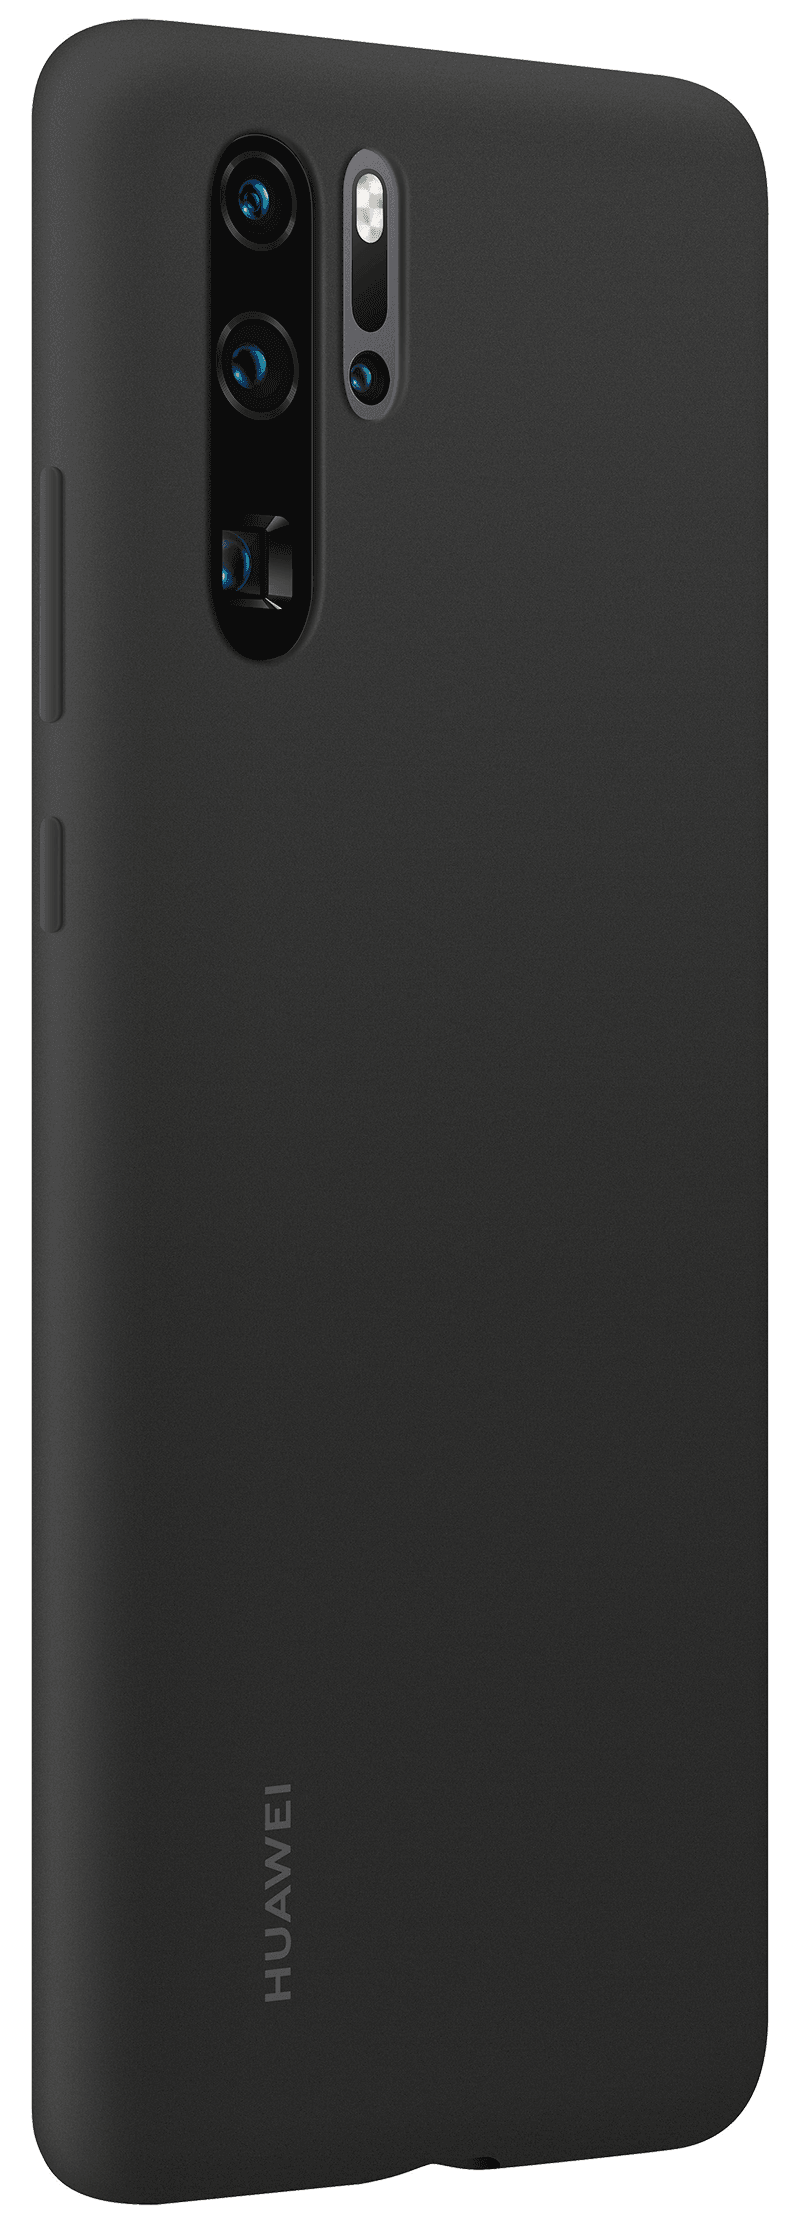 Coque silicone Huawei P30 Pro noir